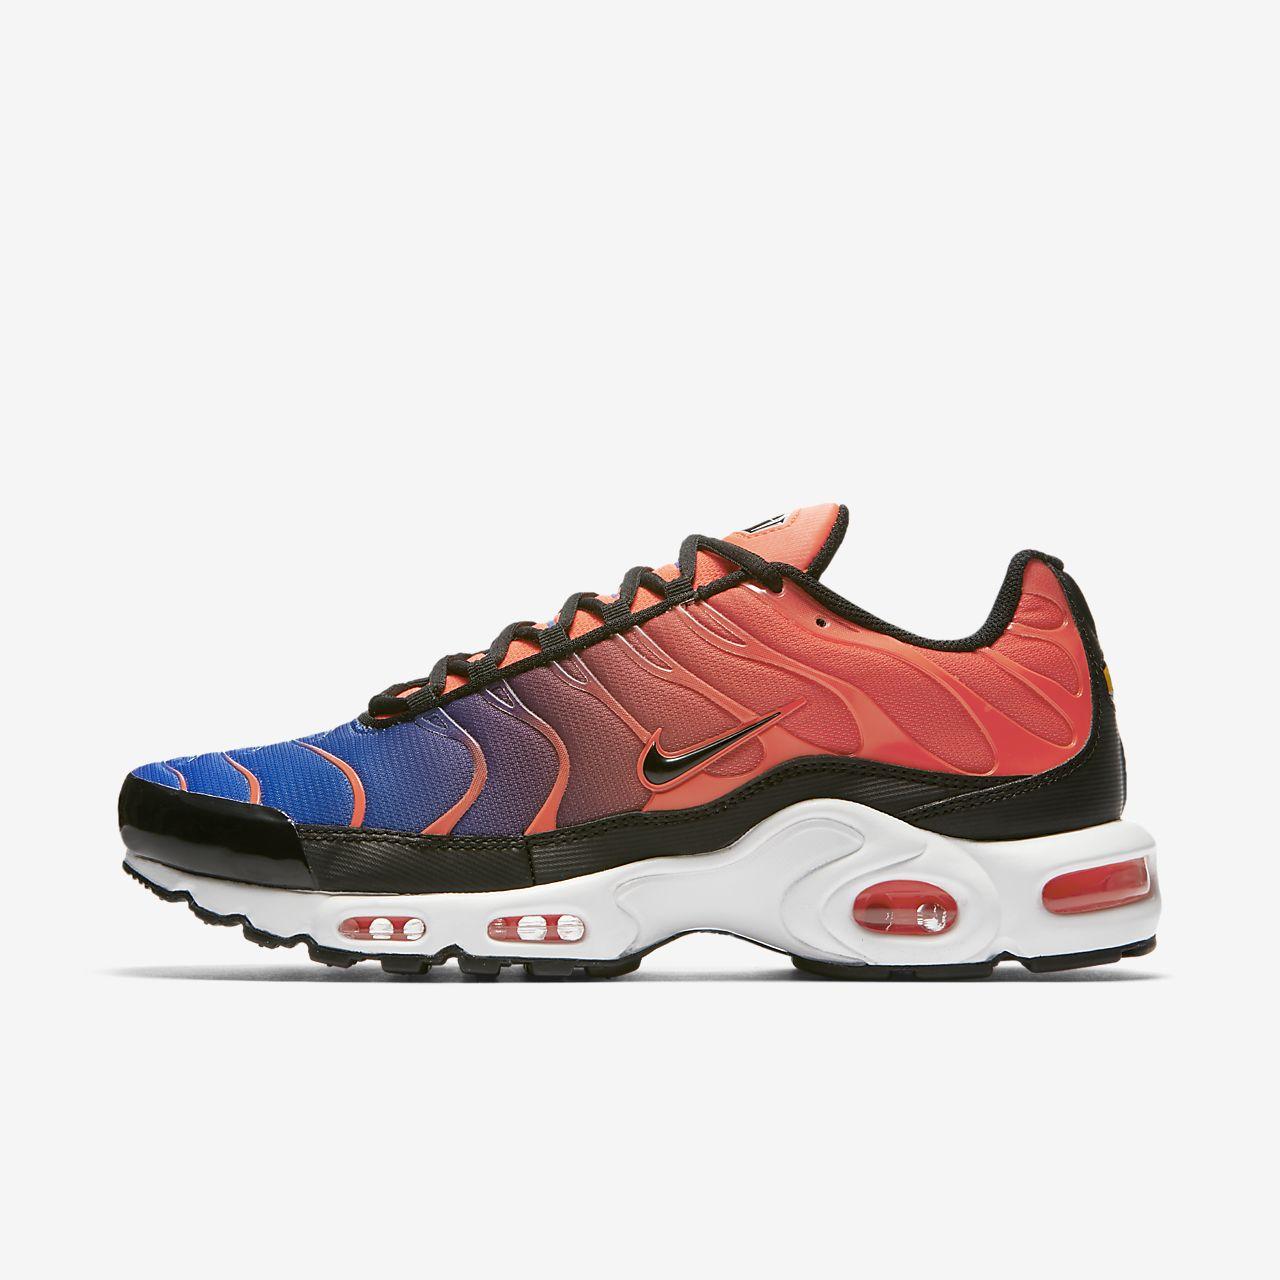 0d34f432f76e ... coupon code for nike air max plus mens shoe efe11 27109